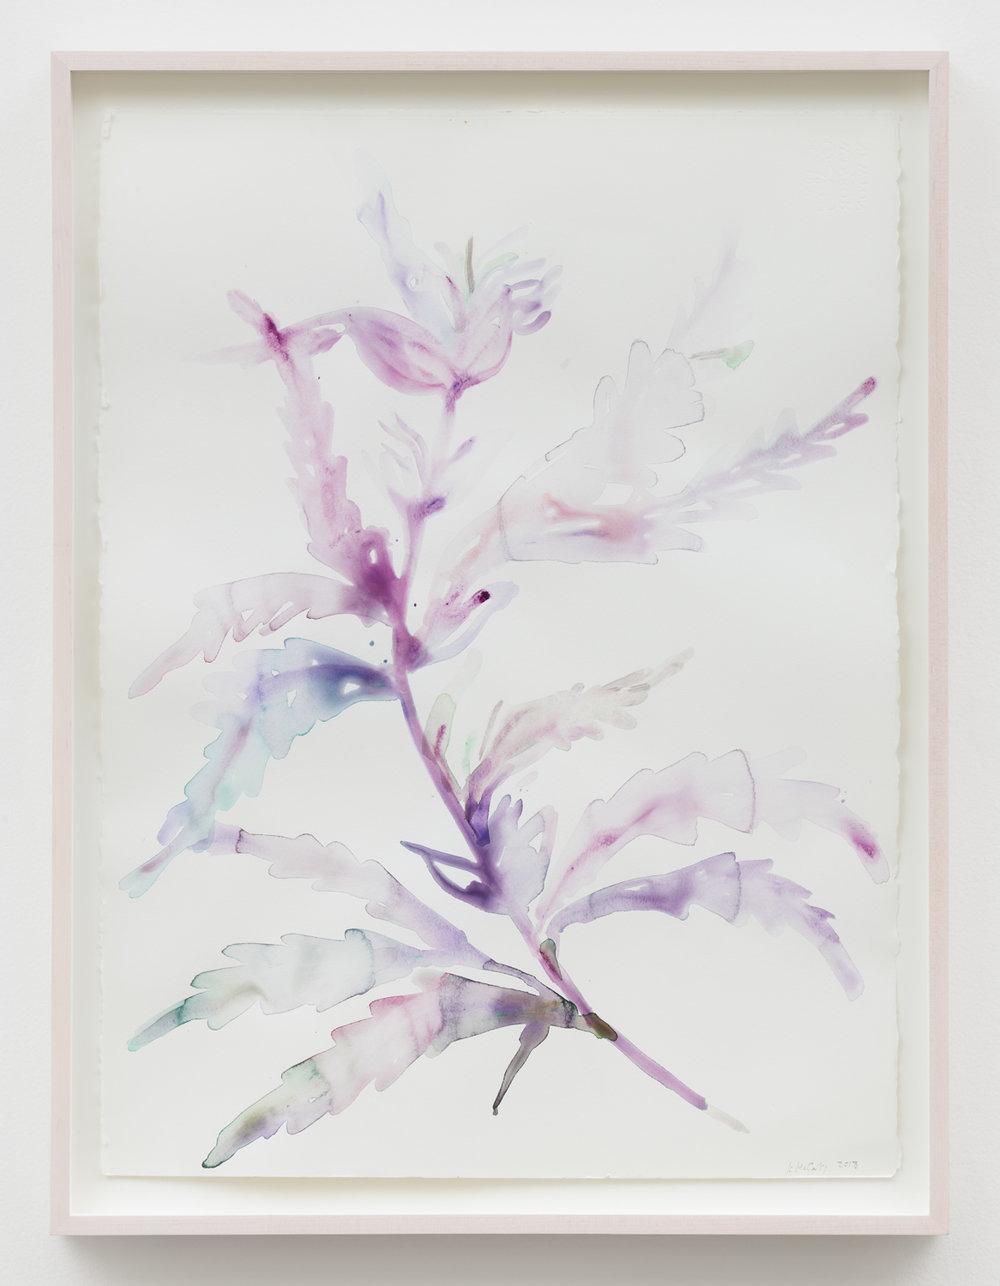 Kim Mccarty   Femaleplant 2 , 2018 watercolor on paper 30 x 22 in - 76,2 x 55,9 cm